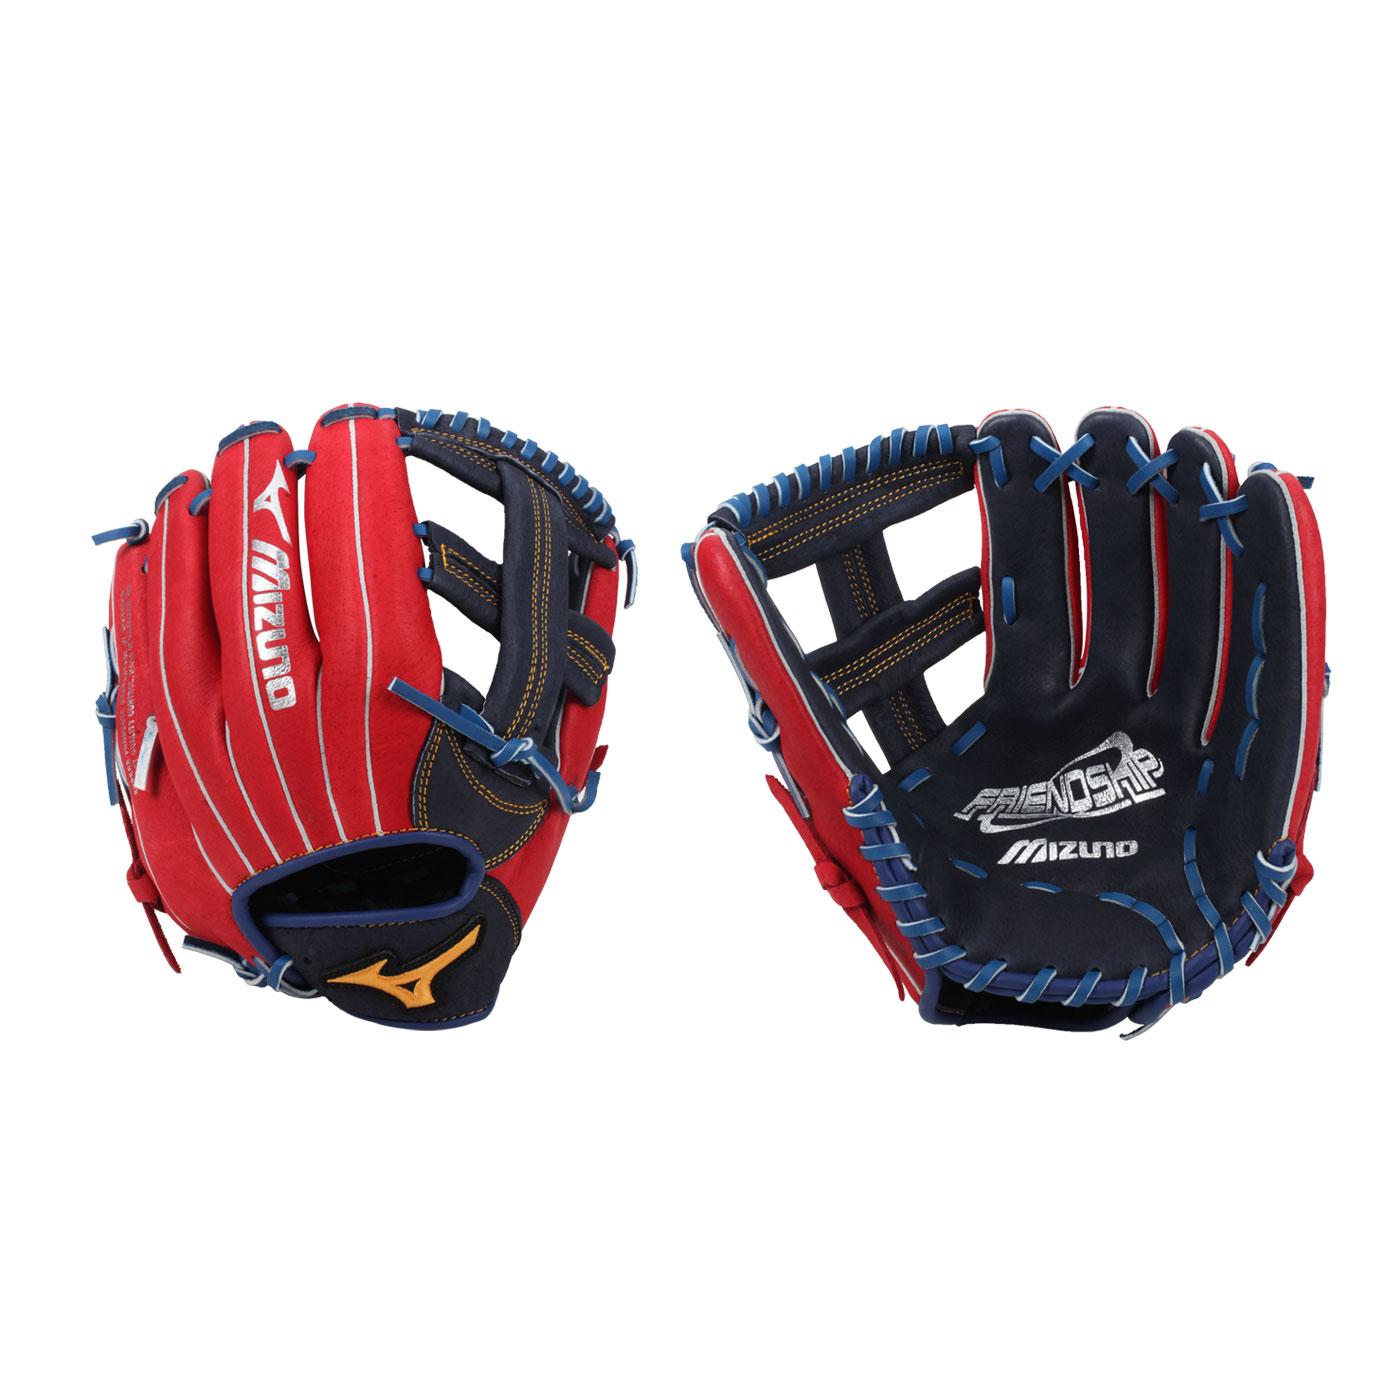 MIZUNO 壘球手套 1ATGS21900-2962 - 紅丈青黃